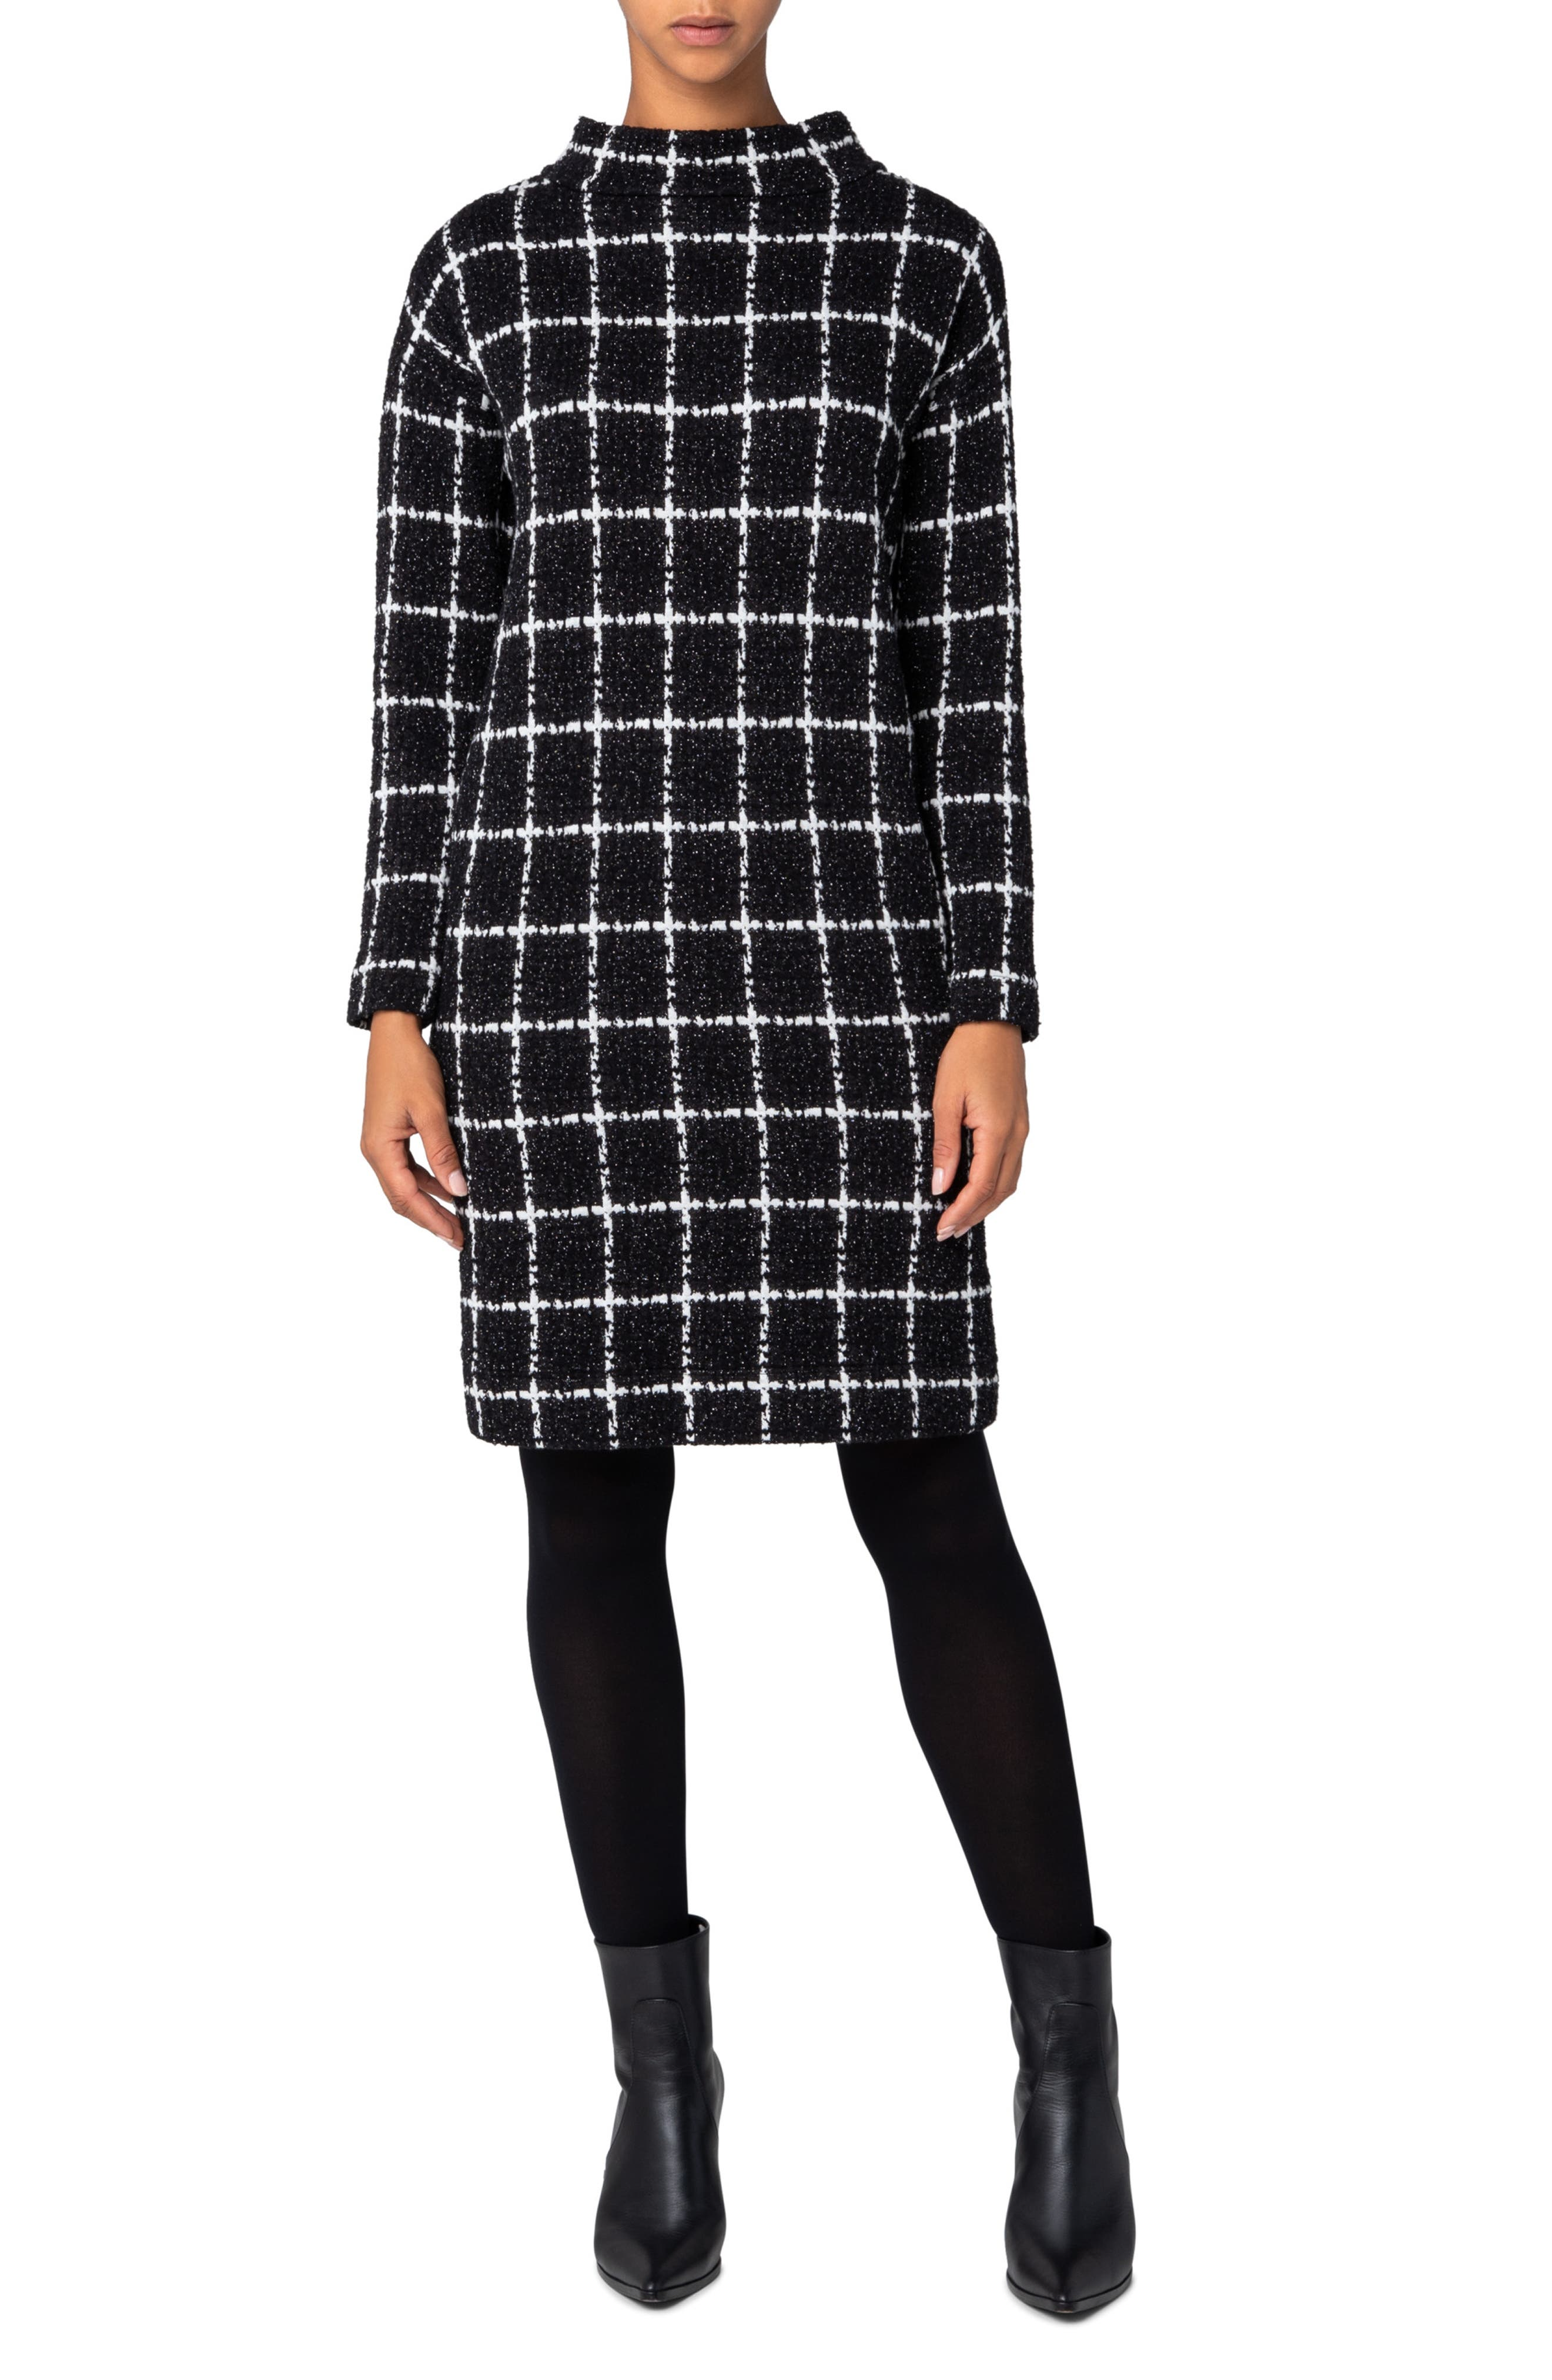 60s Dresses | 1960s Dresses Mod, Mini, Hippie Womens Akris Punto Grid Check Long Sleeve Jersey Dress $1,290.00 AT vintagedancer.com